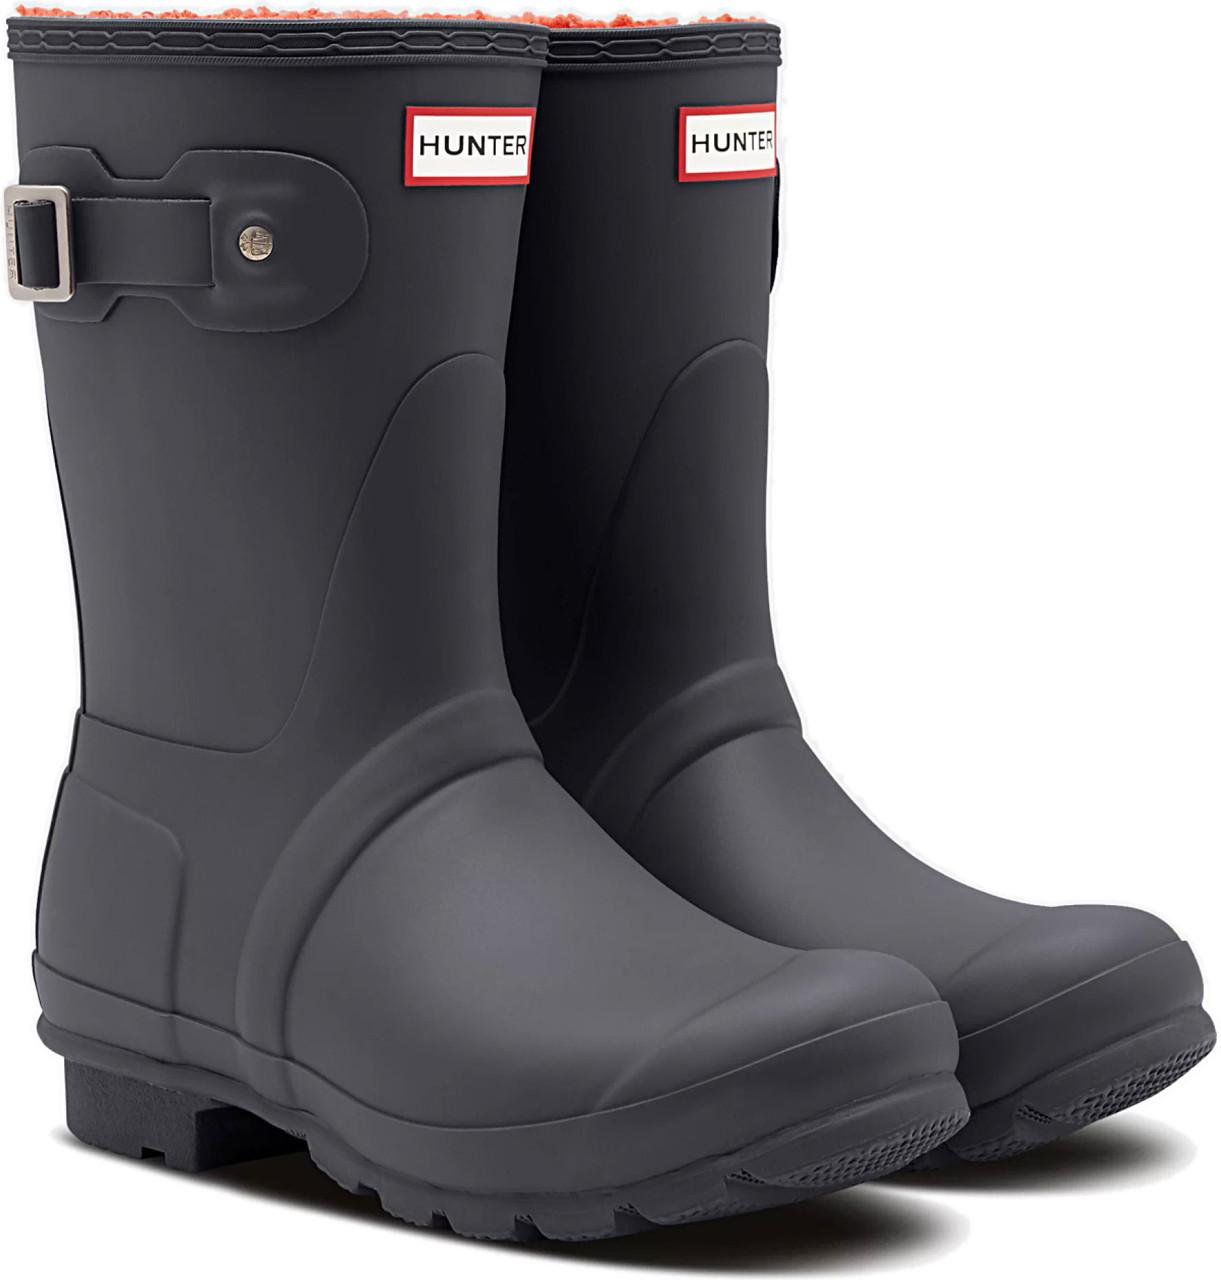 Womens Insulated Rain Boots